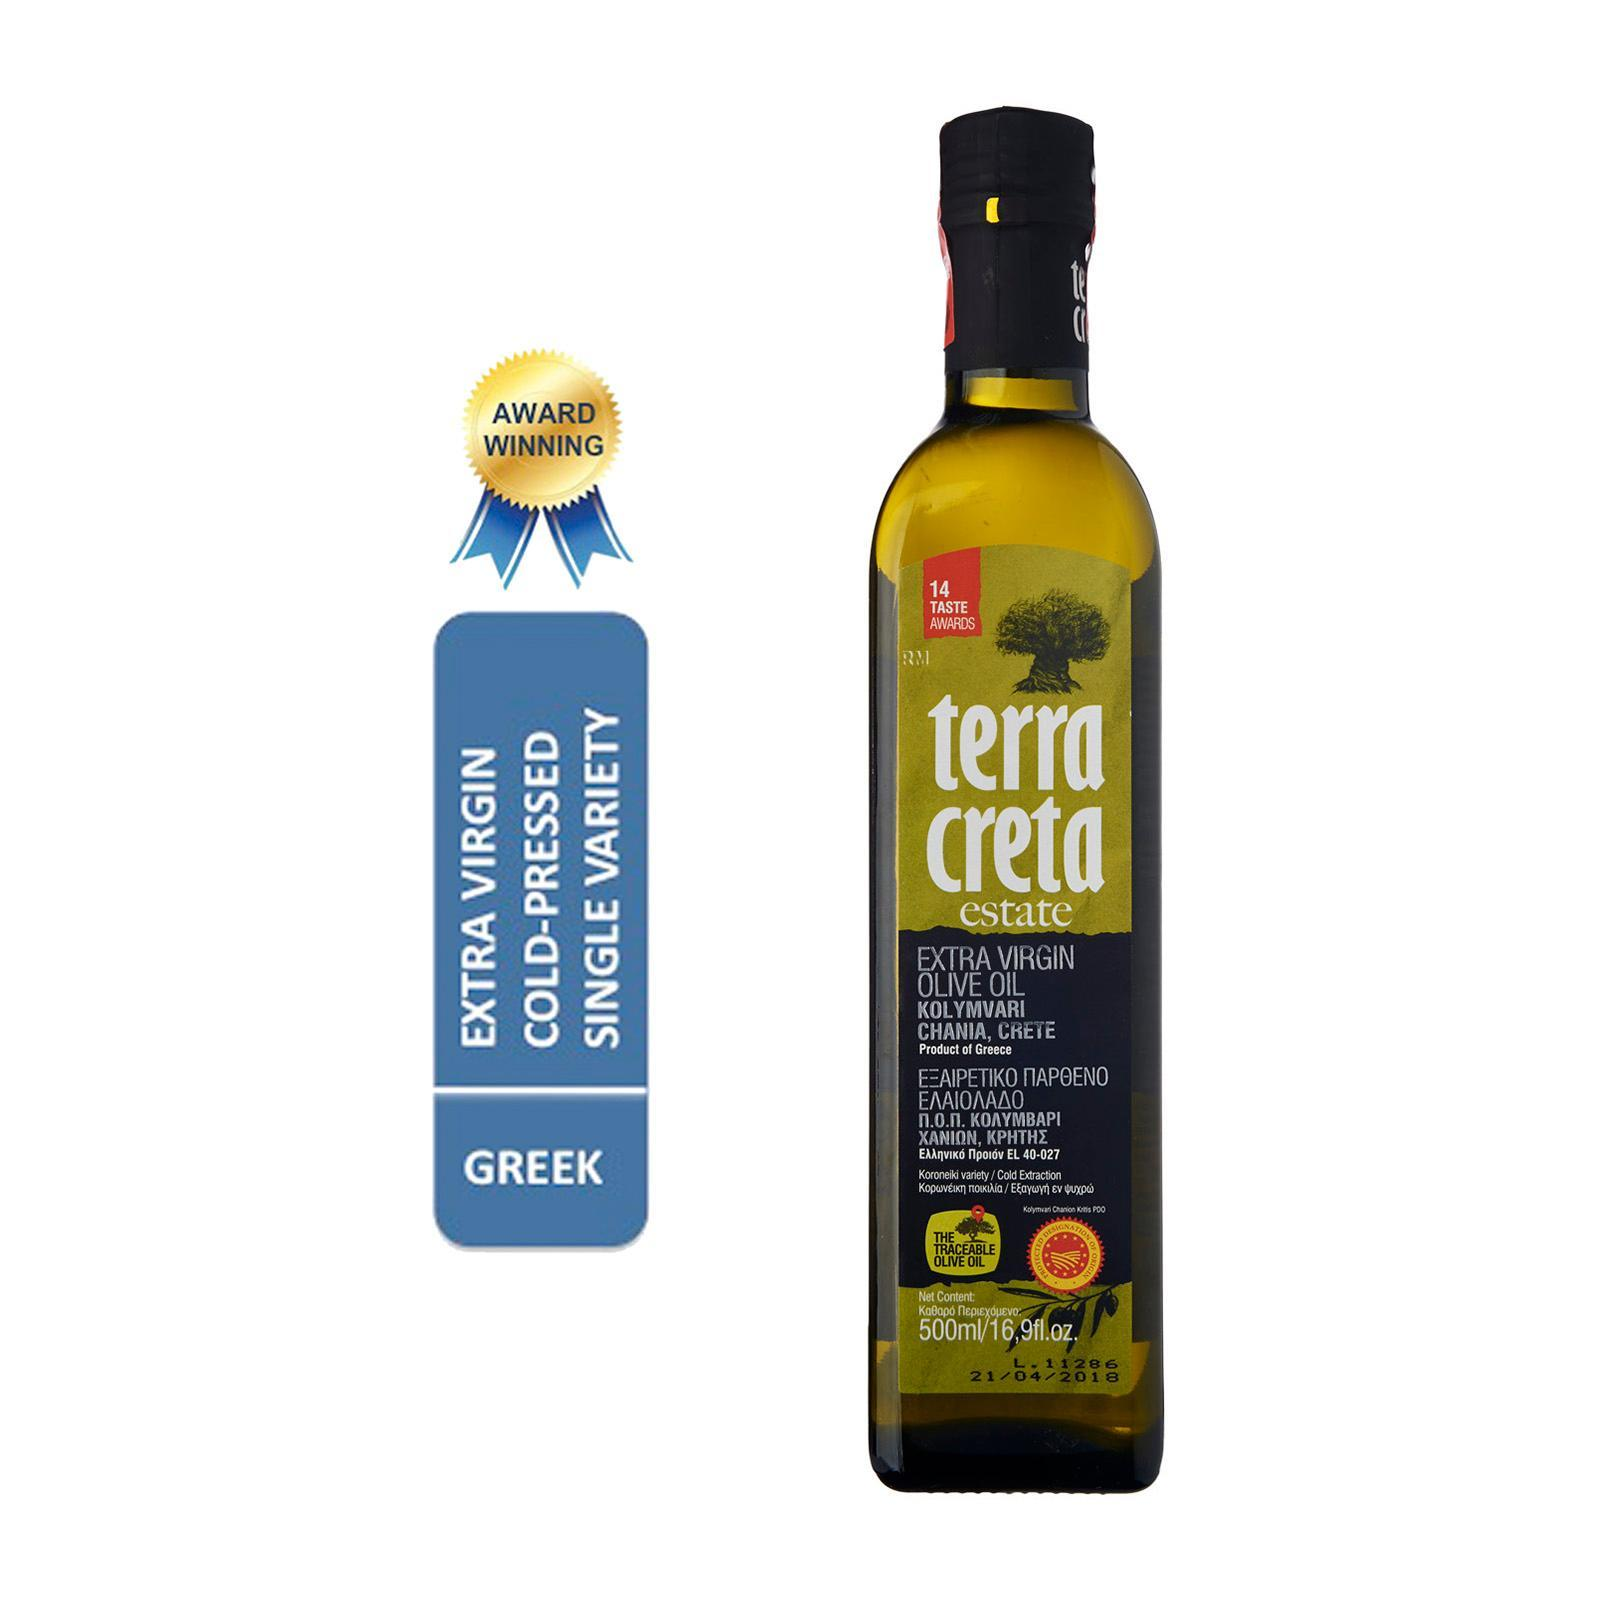 Terra Creta Estate PDO Kolymvari Greek Extra Virgin Olive Oil In A Dark Glass Bottle - By Agora Products